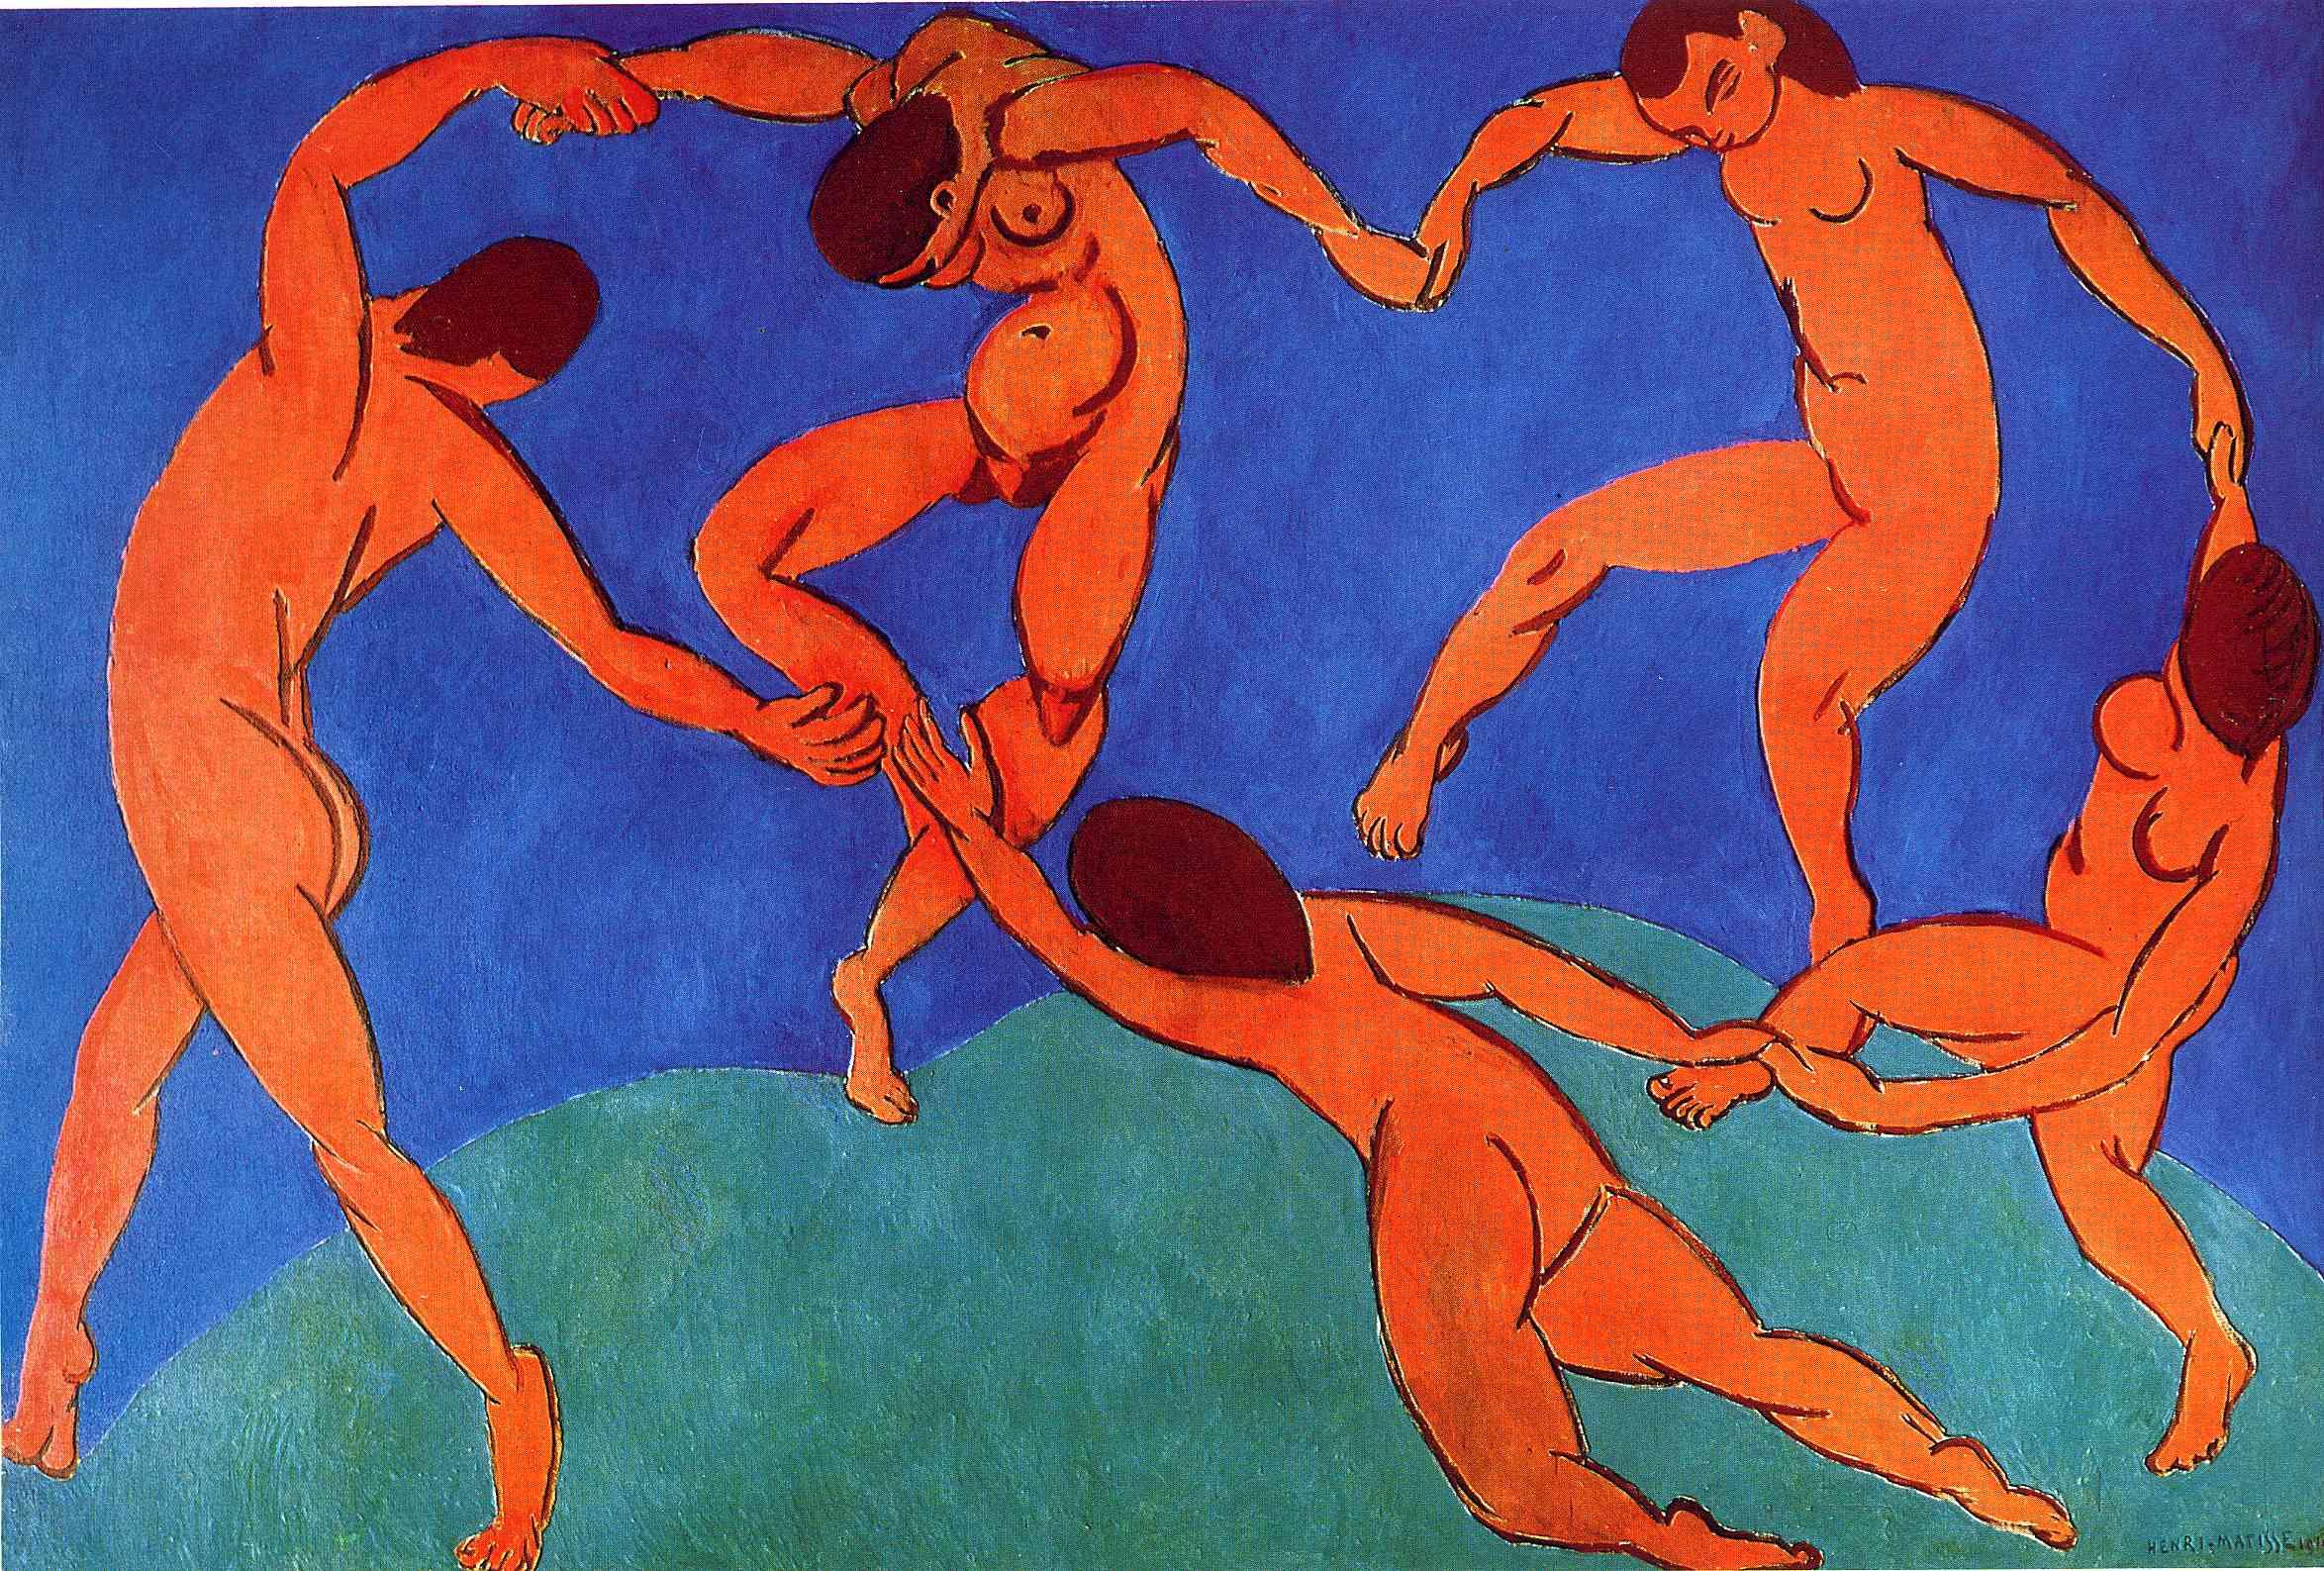 henri matisse aesthetic realism foundation henri matisse dance ii 1910